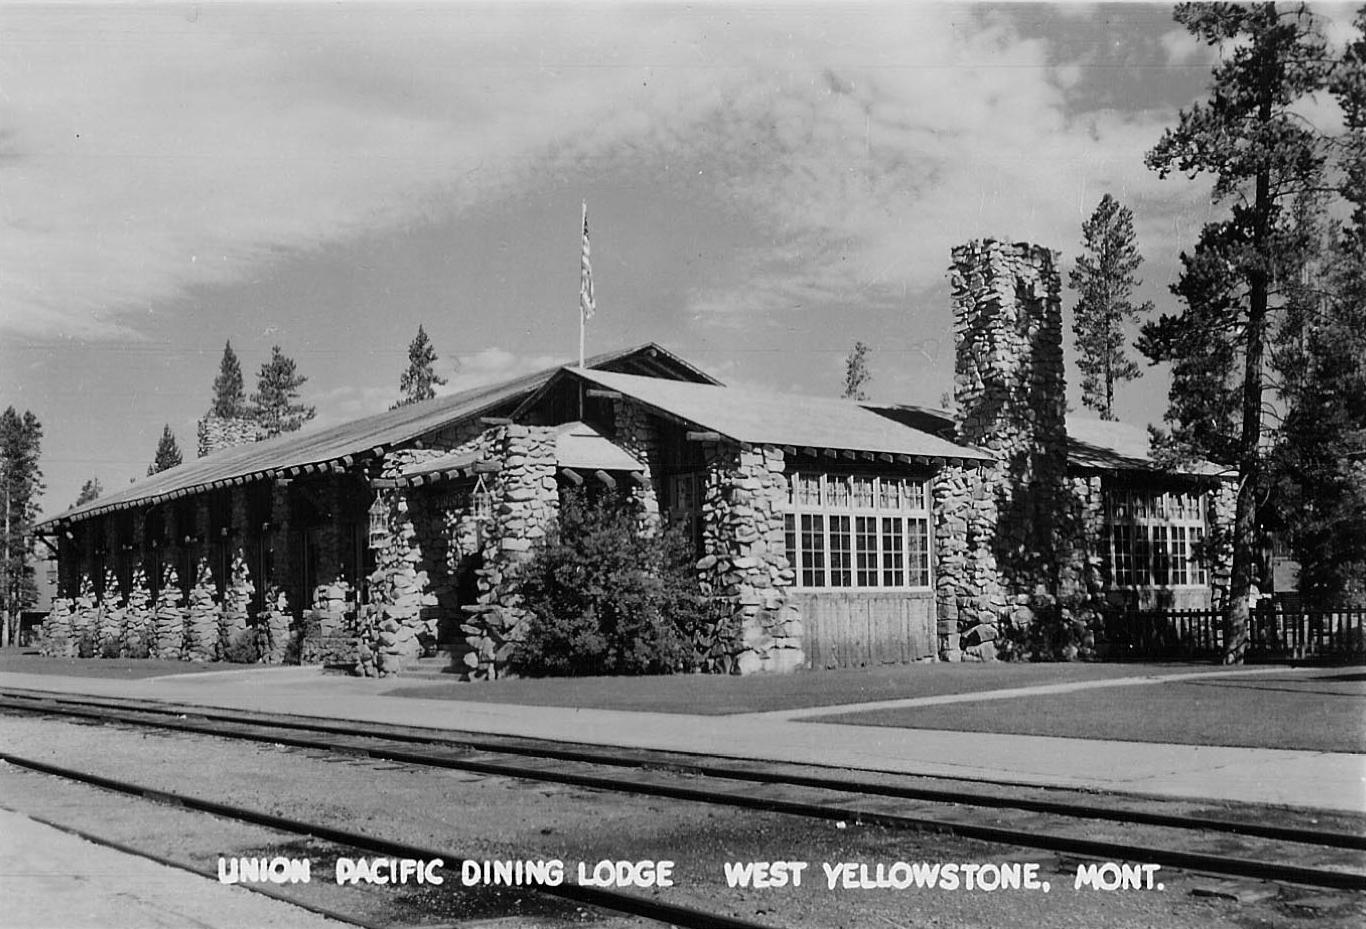 Dining Lodge - 1925